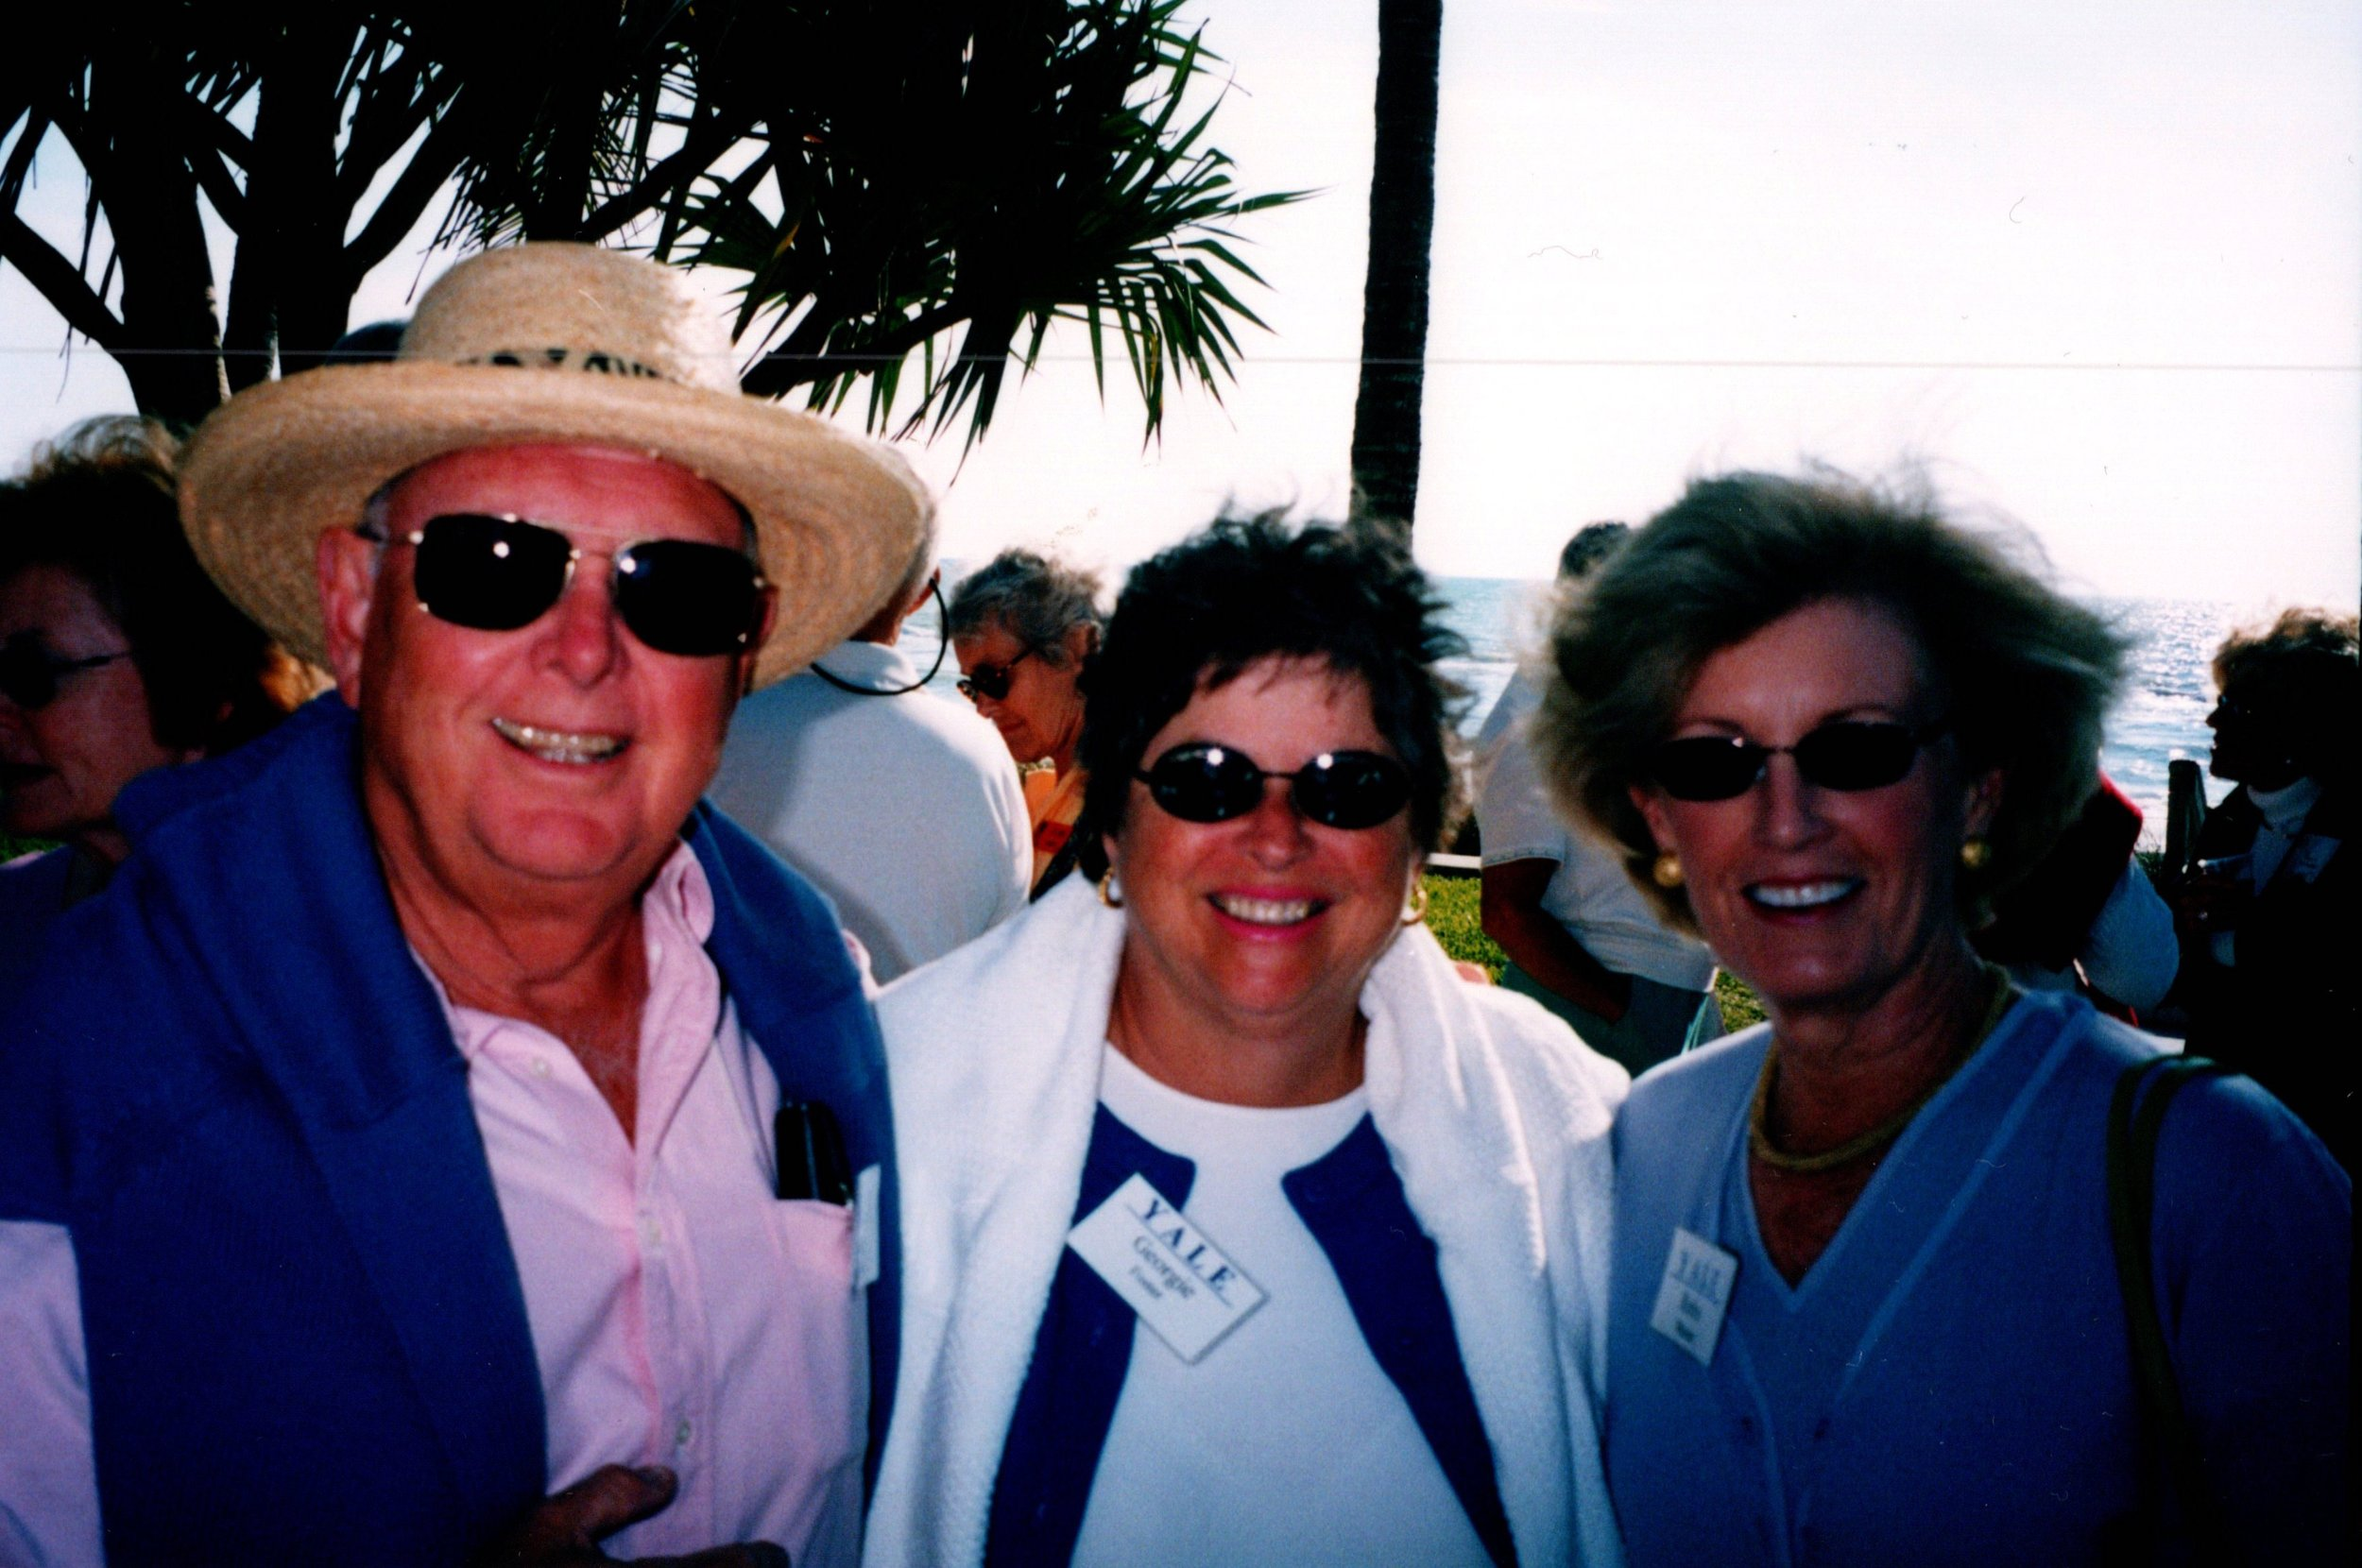 4_ 4_2004 - IVY LEAGUE PICNIC - NAPLES BEACH HOTEL 5.jpg